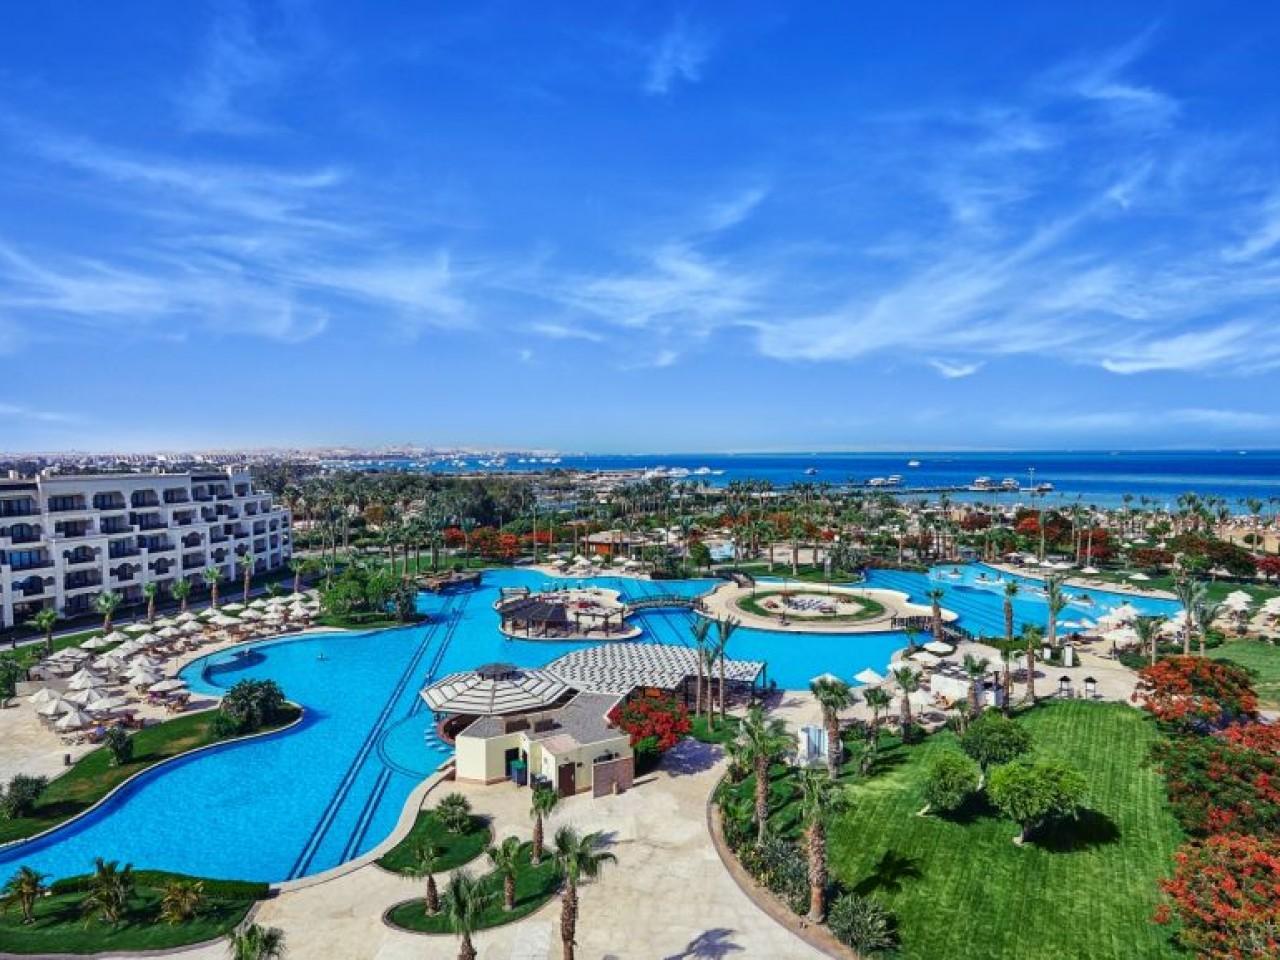 WINTER STAYCATION: Steigenberger ALDAU, Hurghada